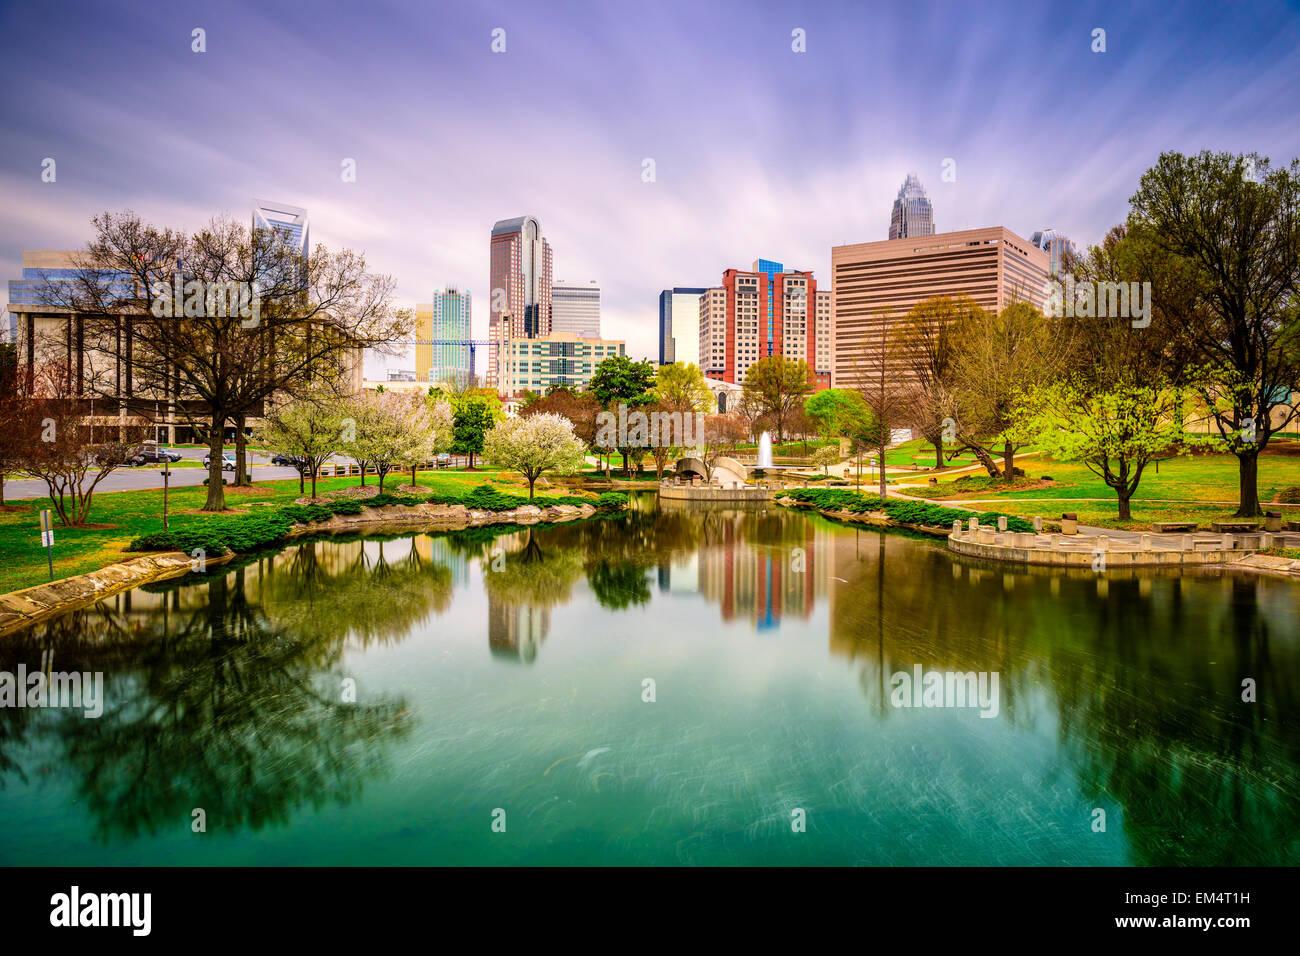 Skyline von Charlotte, North Carolina, USA. Stockfoto